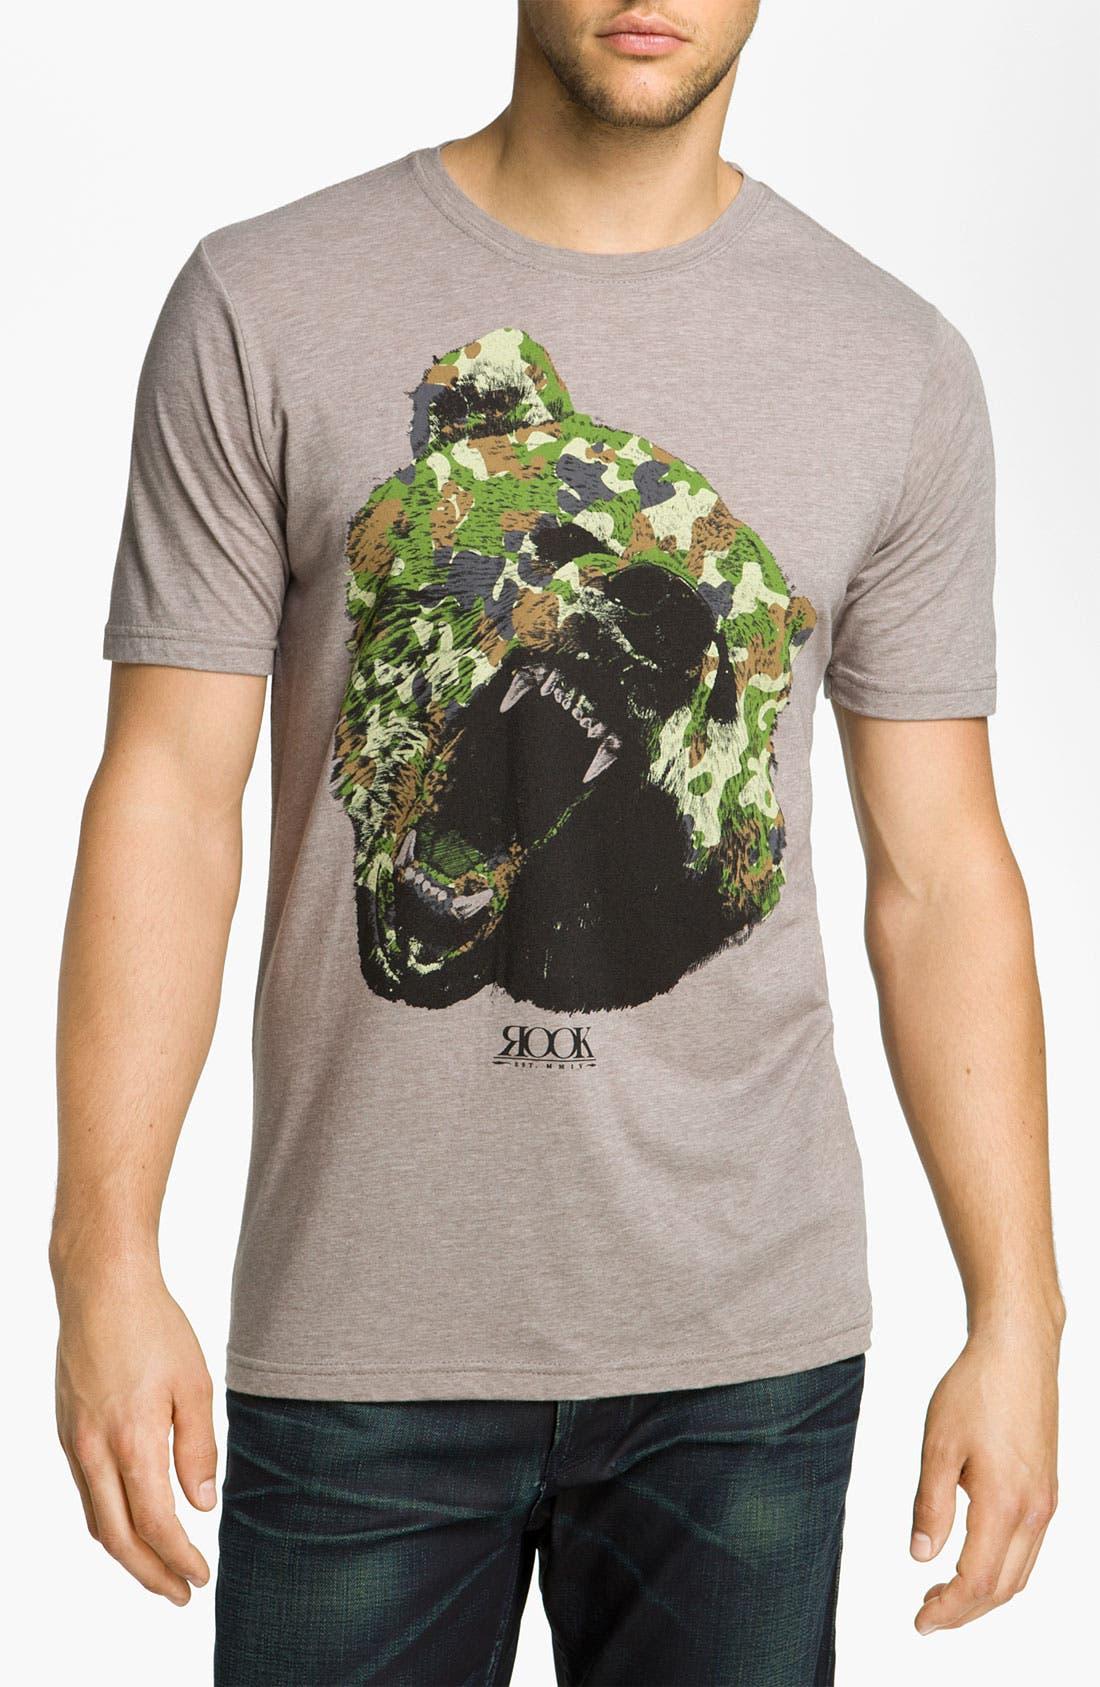 Main Image - Rook 'Camo Bear' Graphic T-Shirt